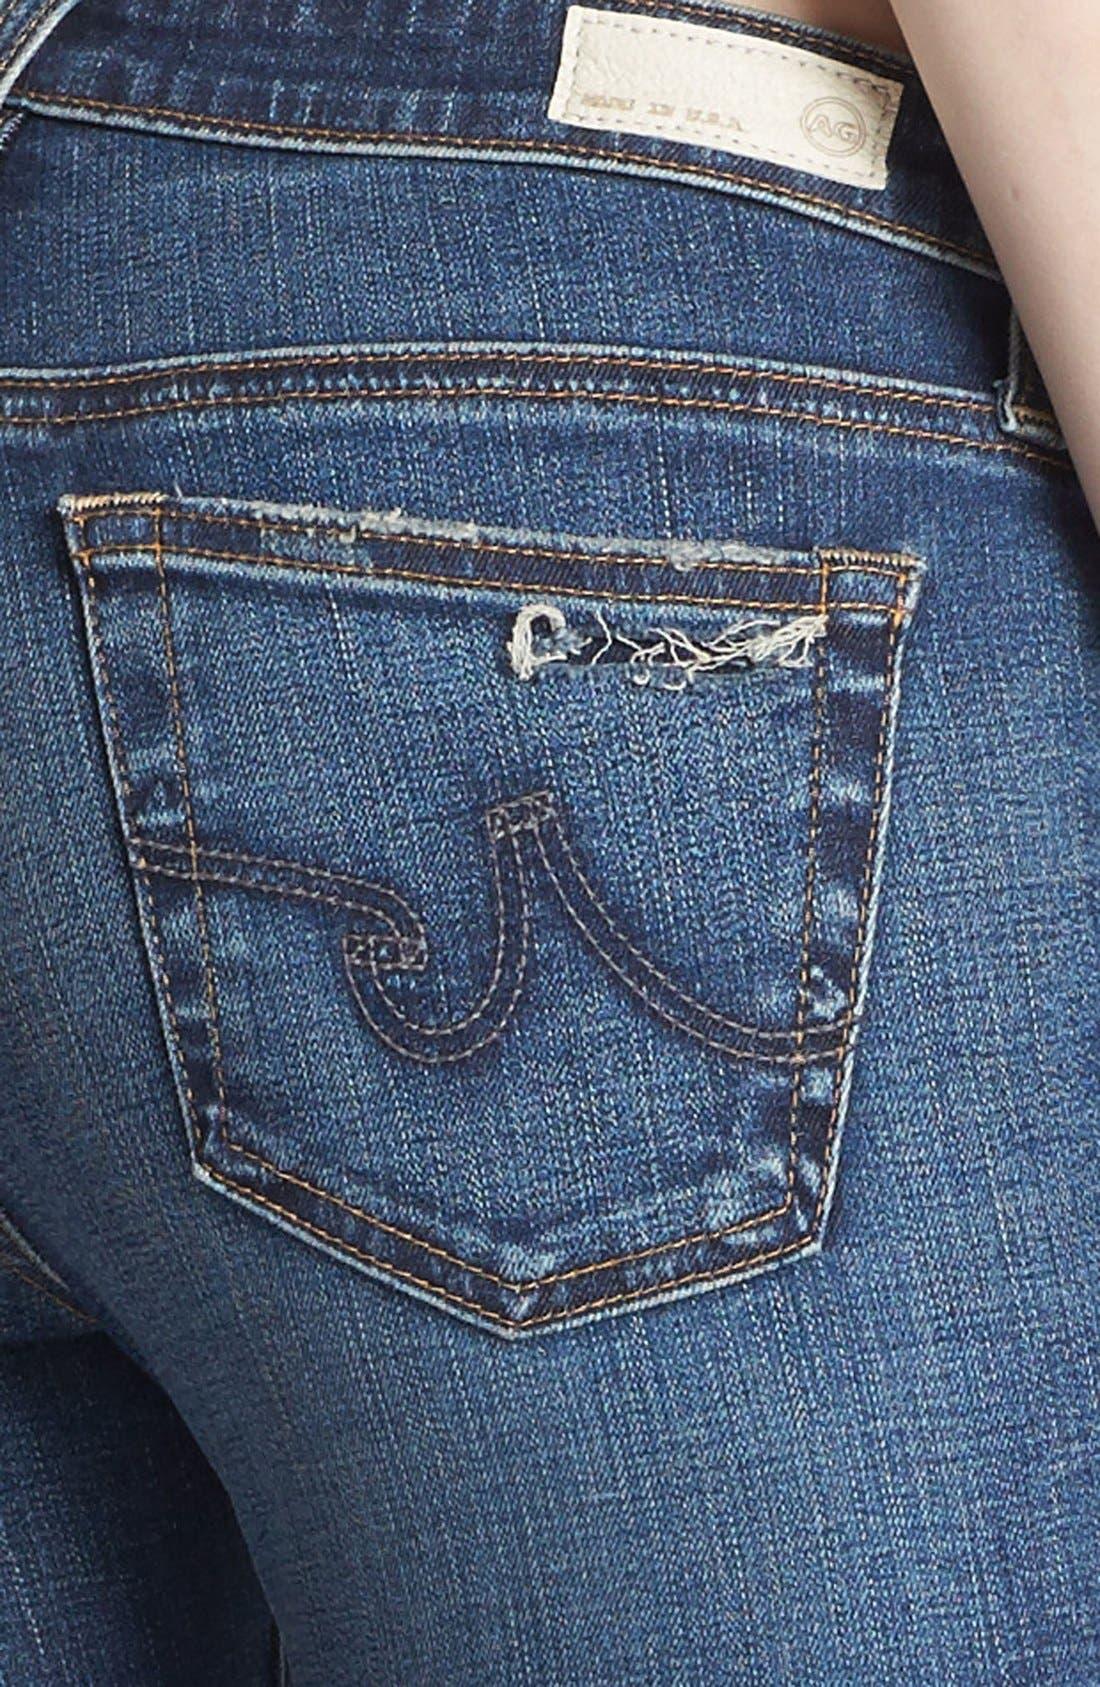 Alternate Image 5  - AG 'The Legging' Ankle Jeans (7 Year Break with Raw Hem)